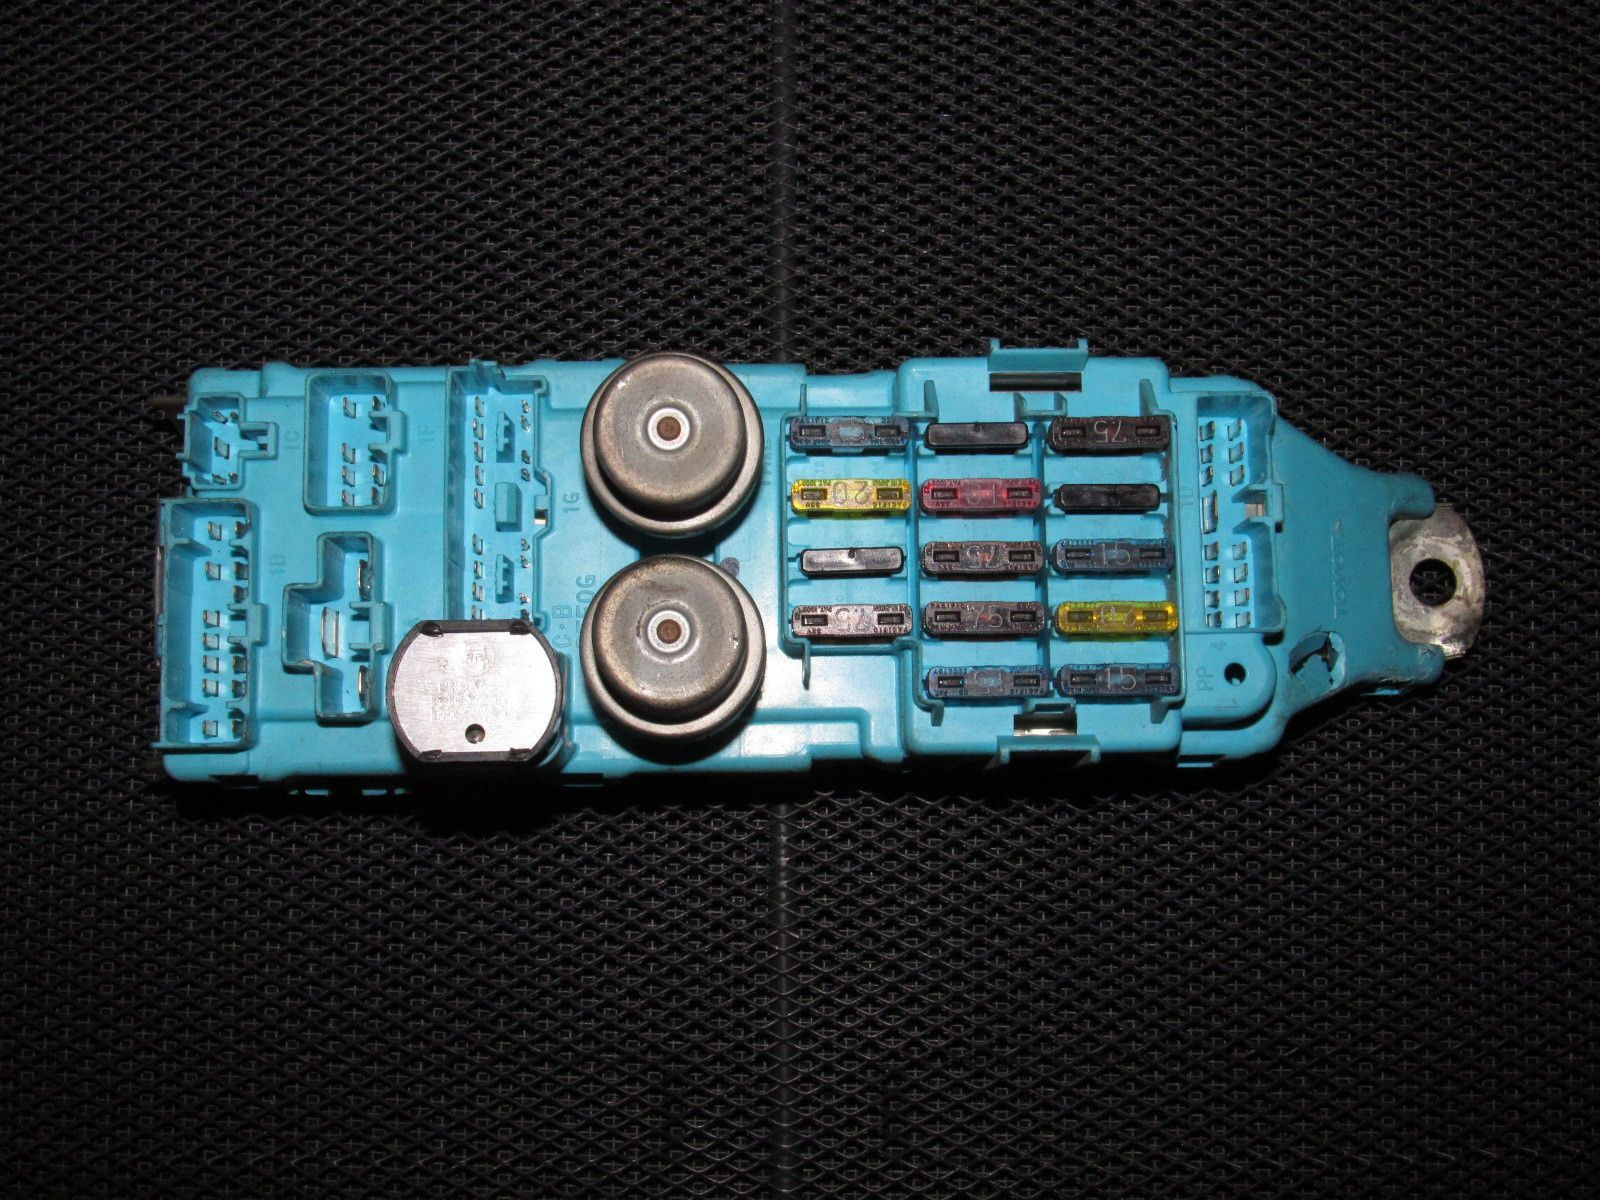 hight resolution of 86 87 88 toyota supra oem turbo interior fuse box autopartone com rh pinterest com 88